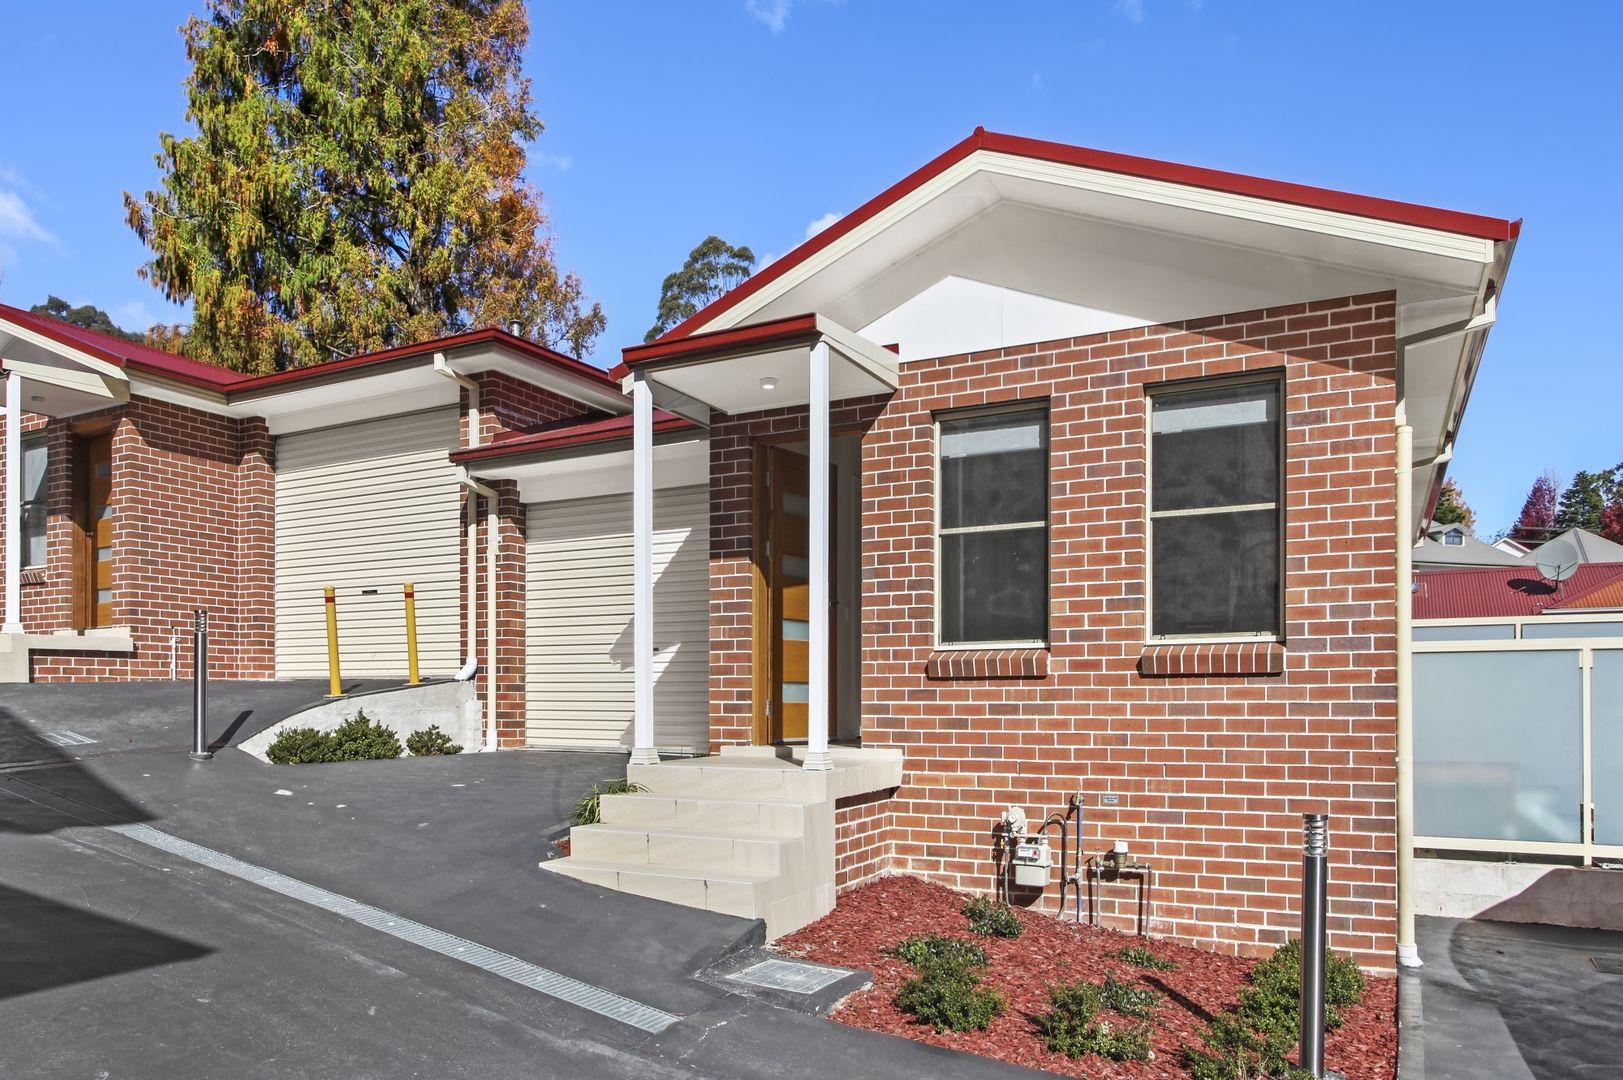 11/5 Wascoe Street, Leura NSW 2780, Image 0